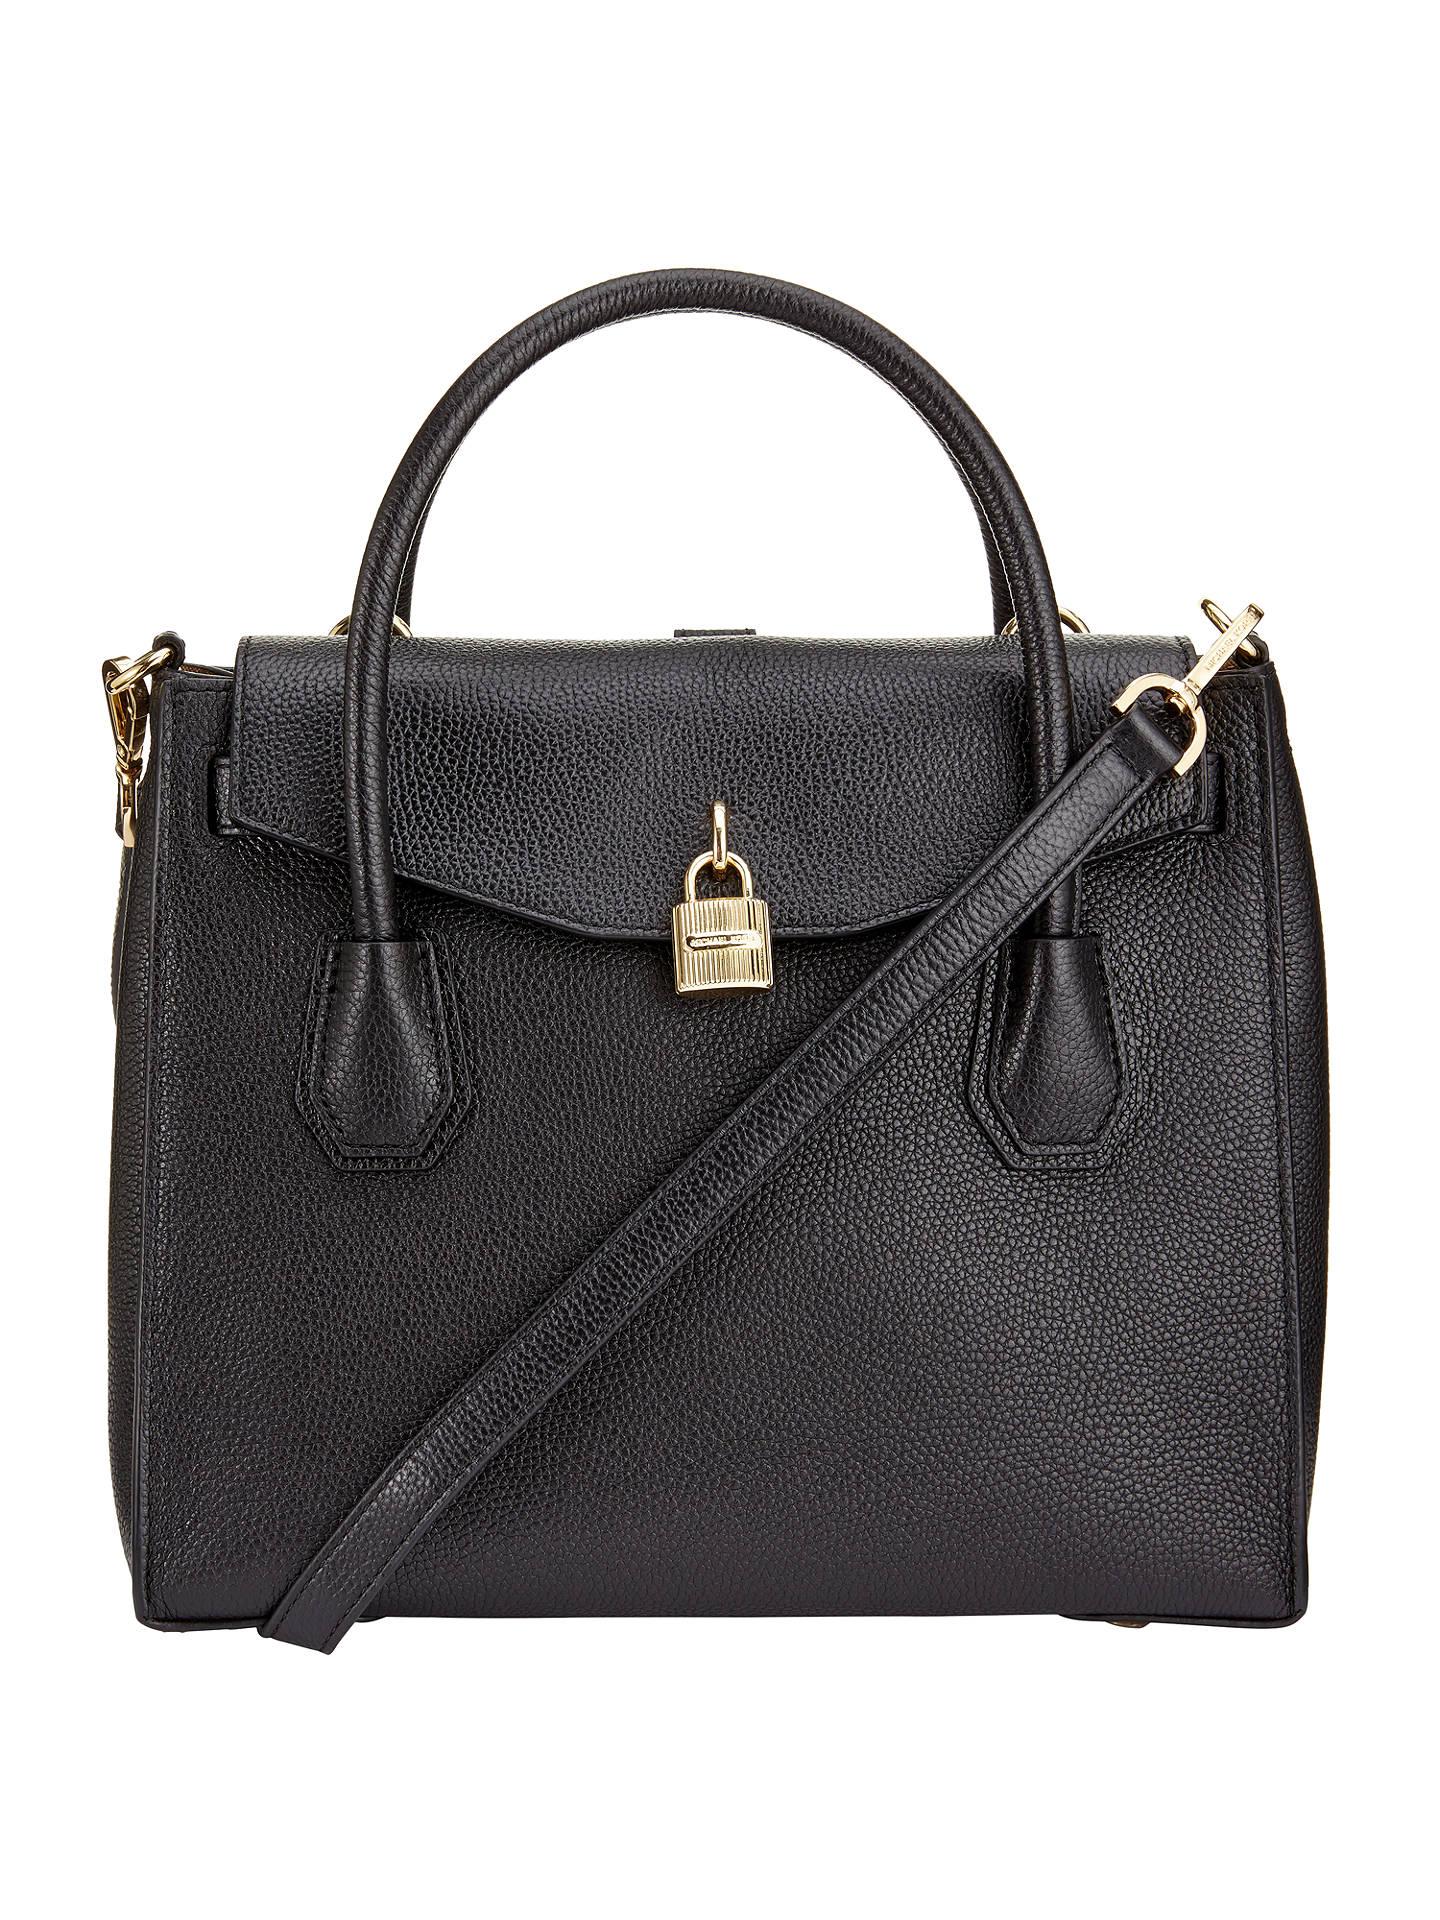 9de1f39c0865 MICHAEL Michael Kors Mercer Large Leather Shoulder Bag at John Lewis ...